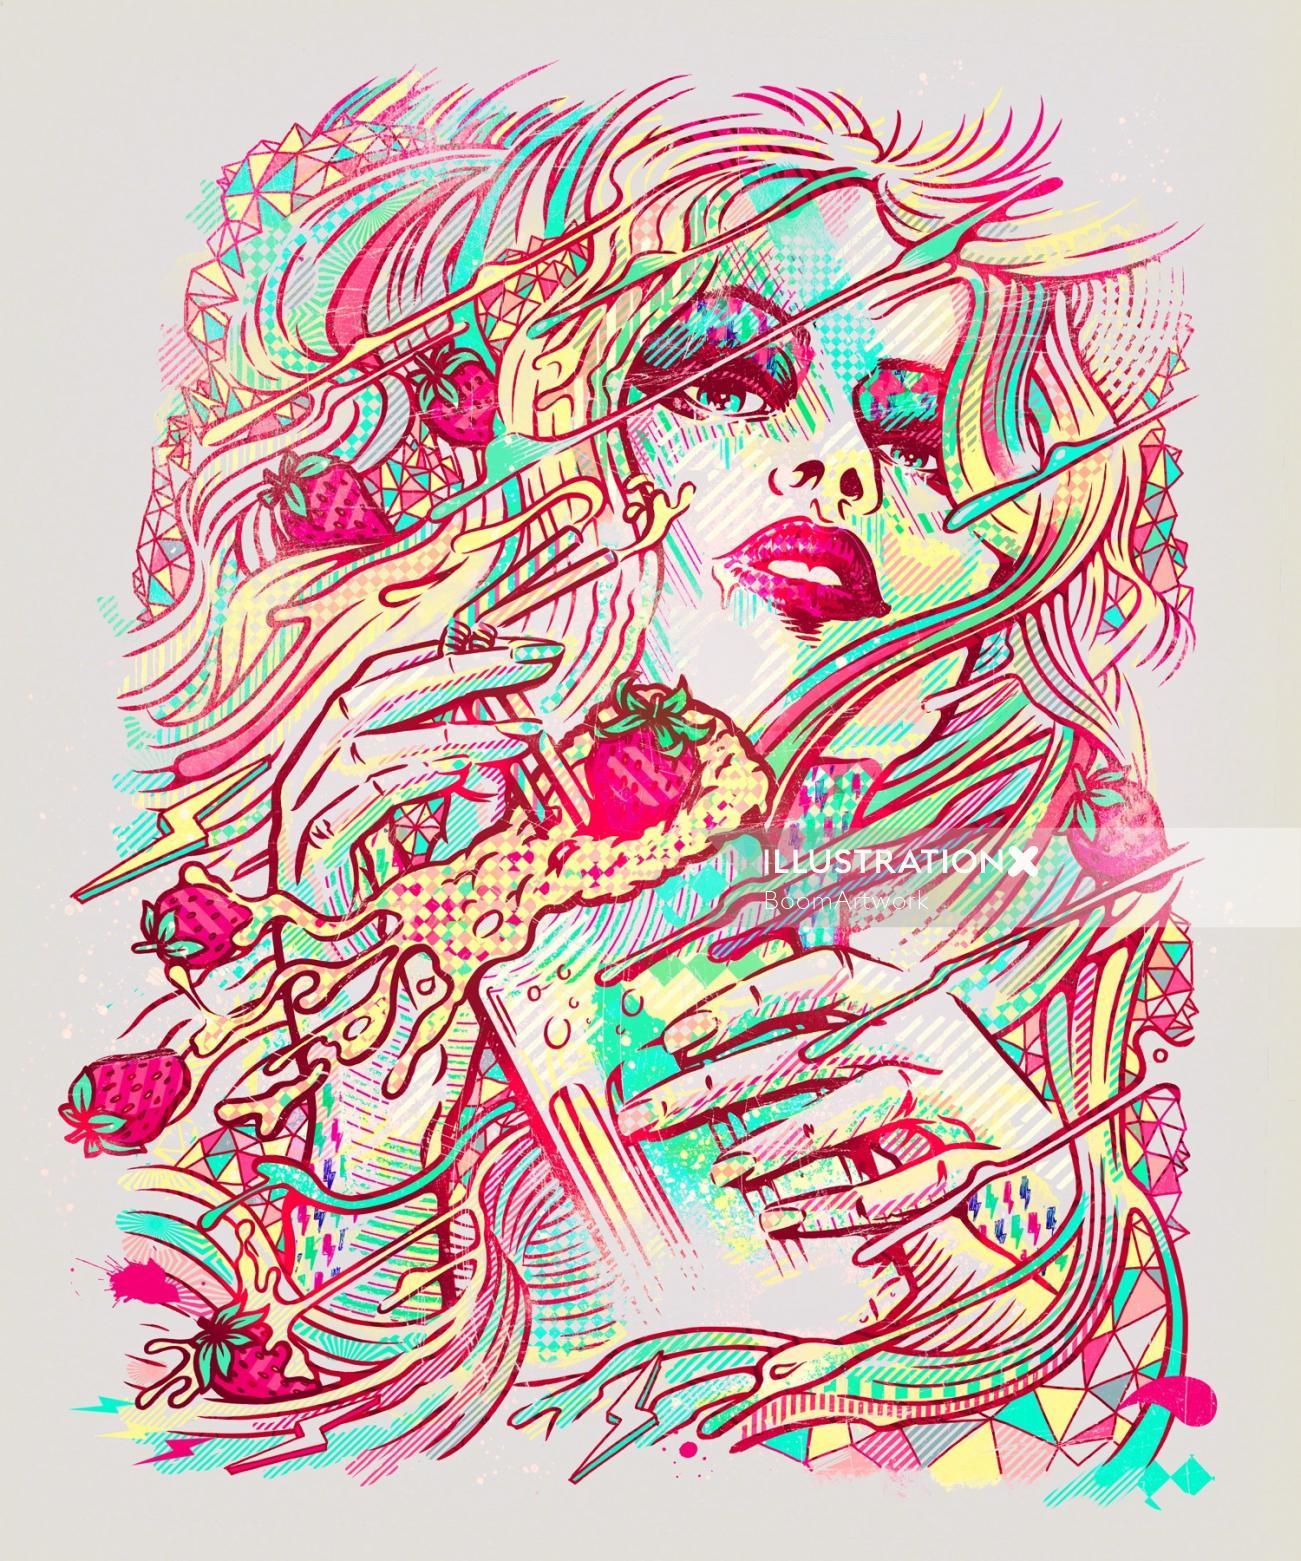 Woman contemporary illustration